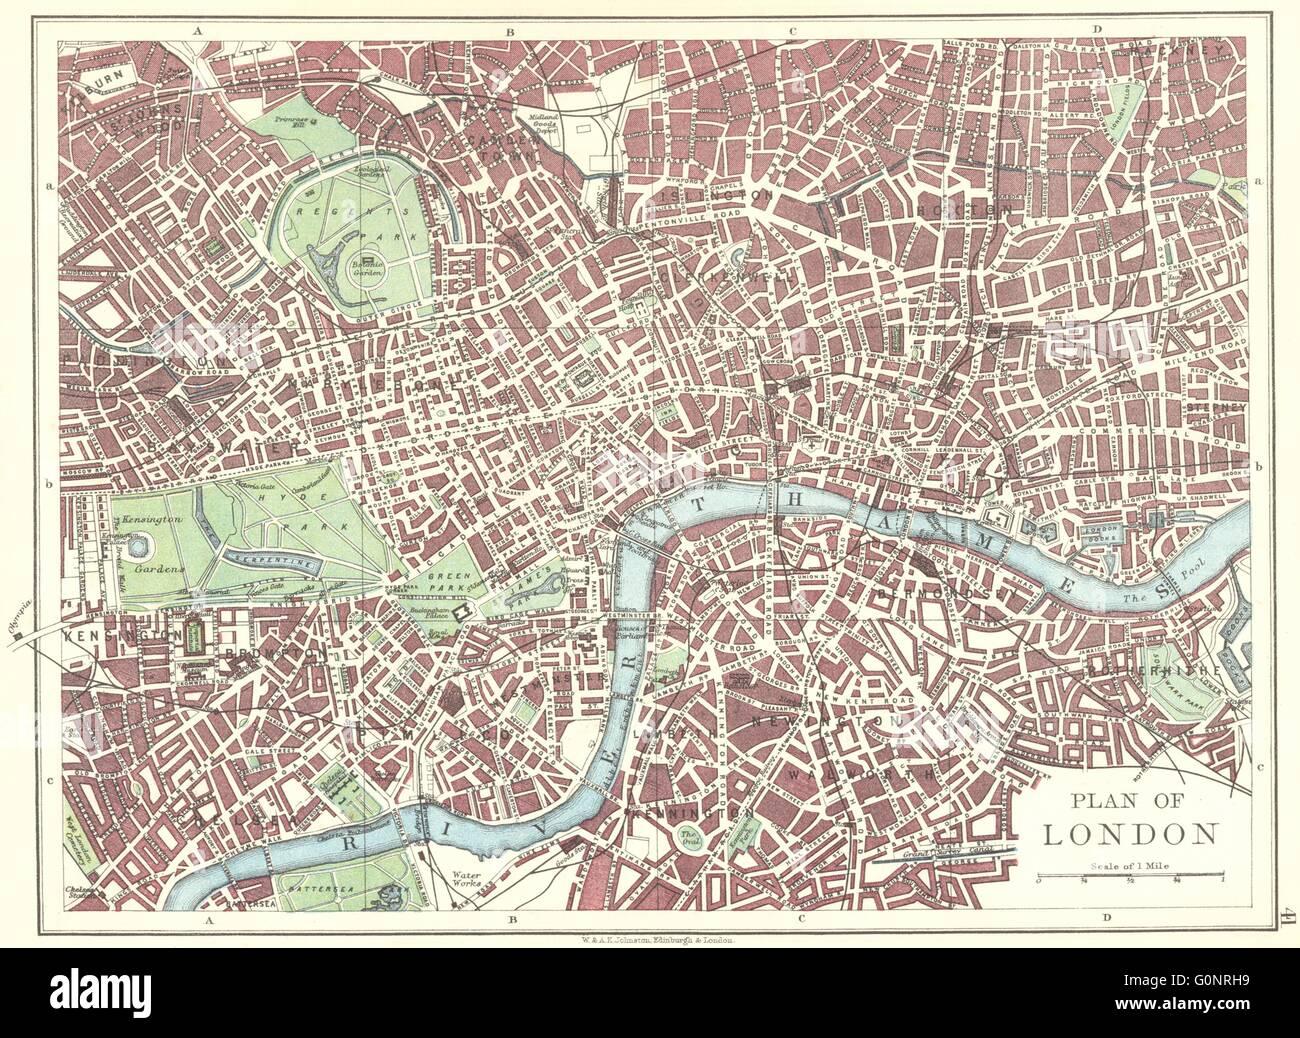 Pimlico London Map.London Plan West End Pimlico City Southwark Islington Stock Photo